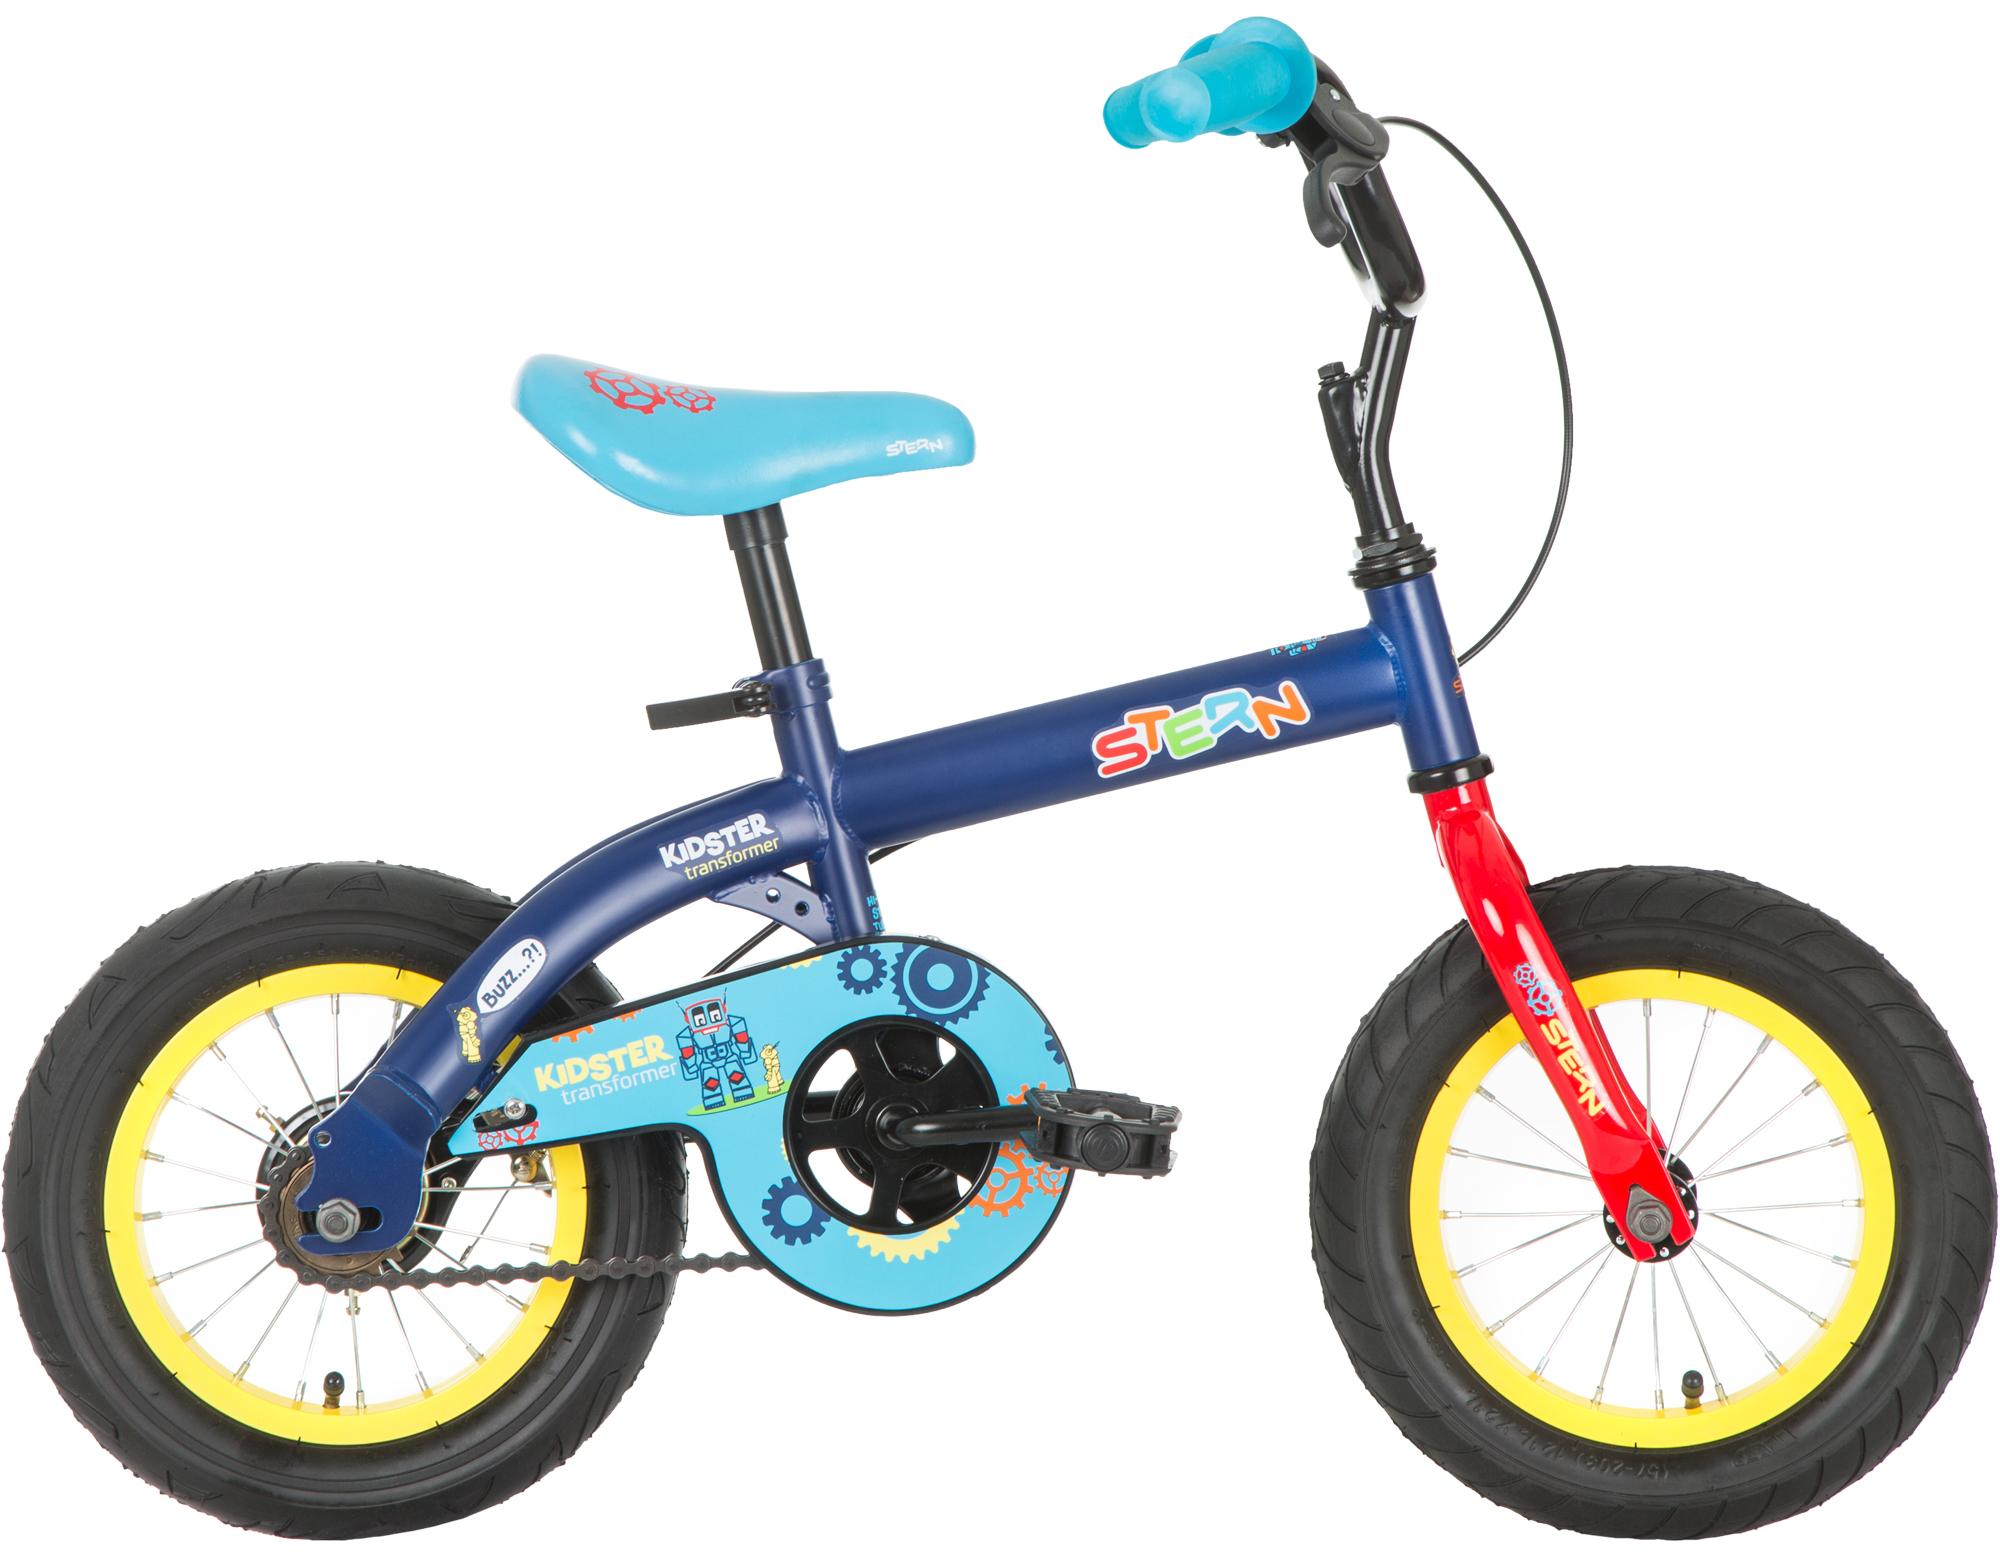 "Stern Велосипед детский Stern Kidster Transformer 12"""